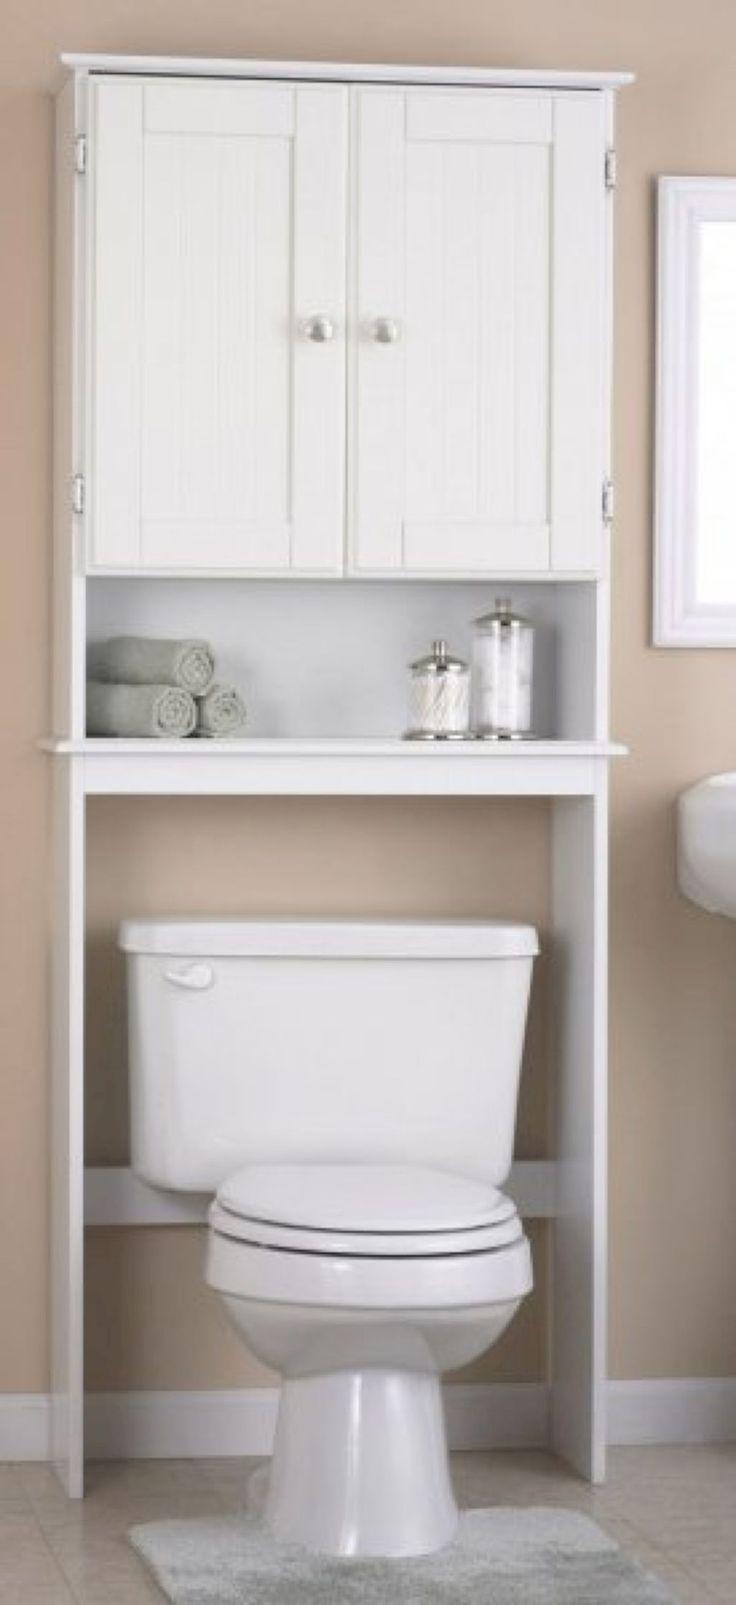 Adorable 62 Beautiful Bathroom Storage Ideas https://bellezaroom.com/2017/09/10/62-beautiful-bathroom-storage-ideas/